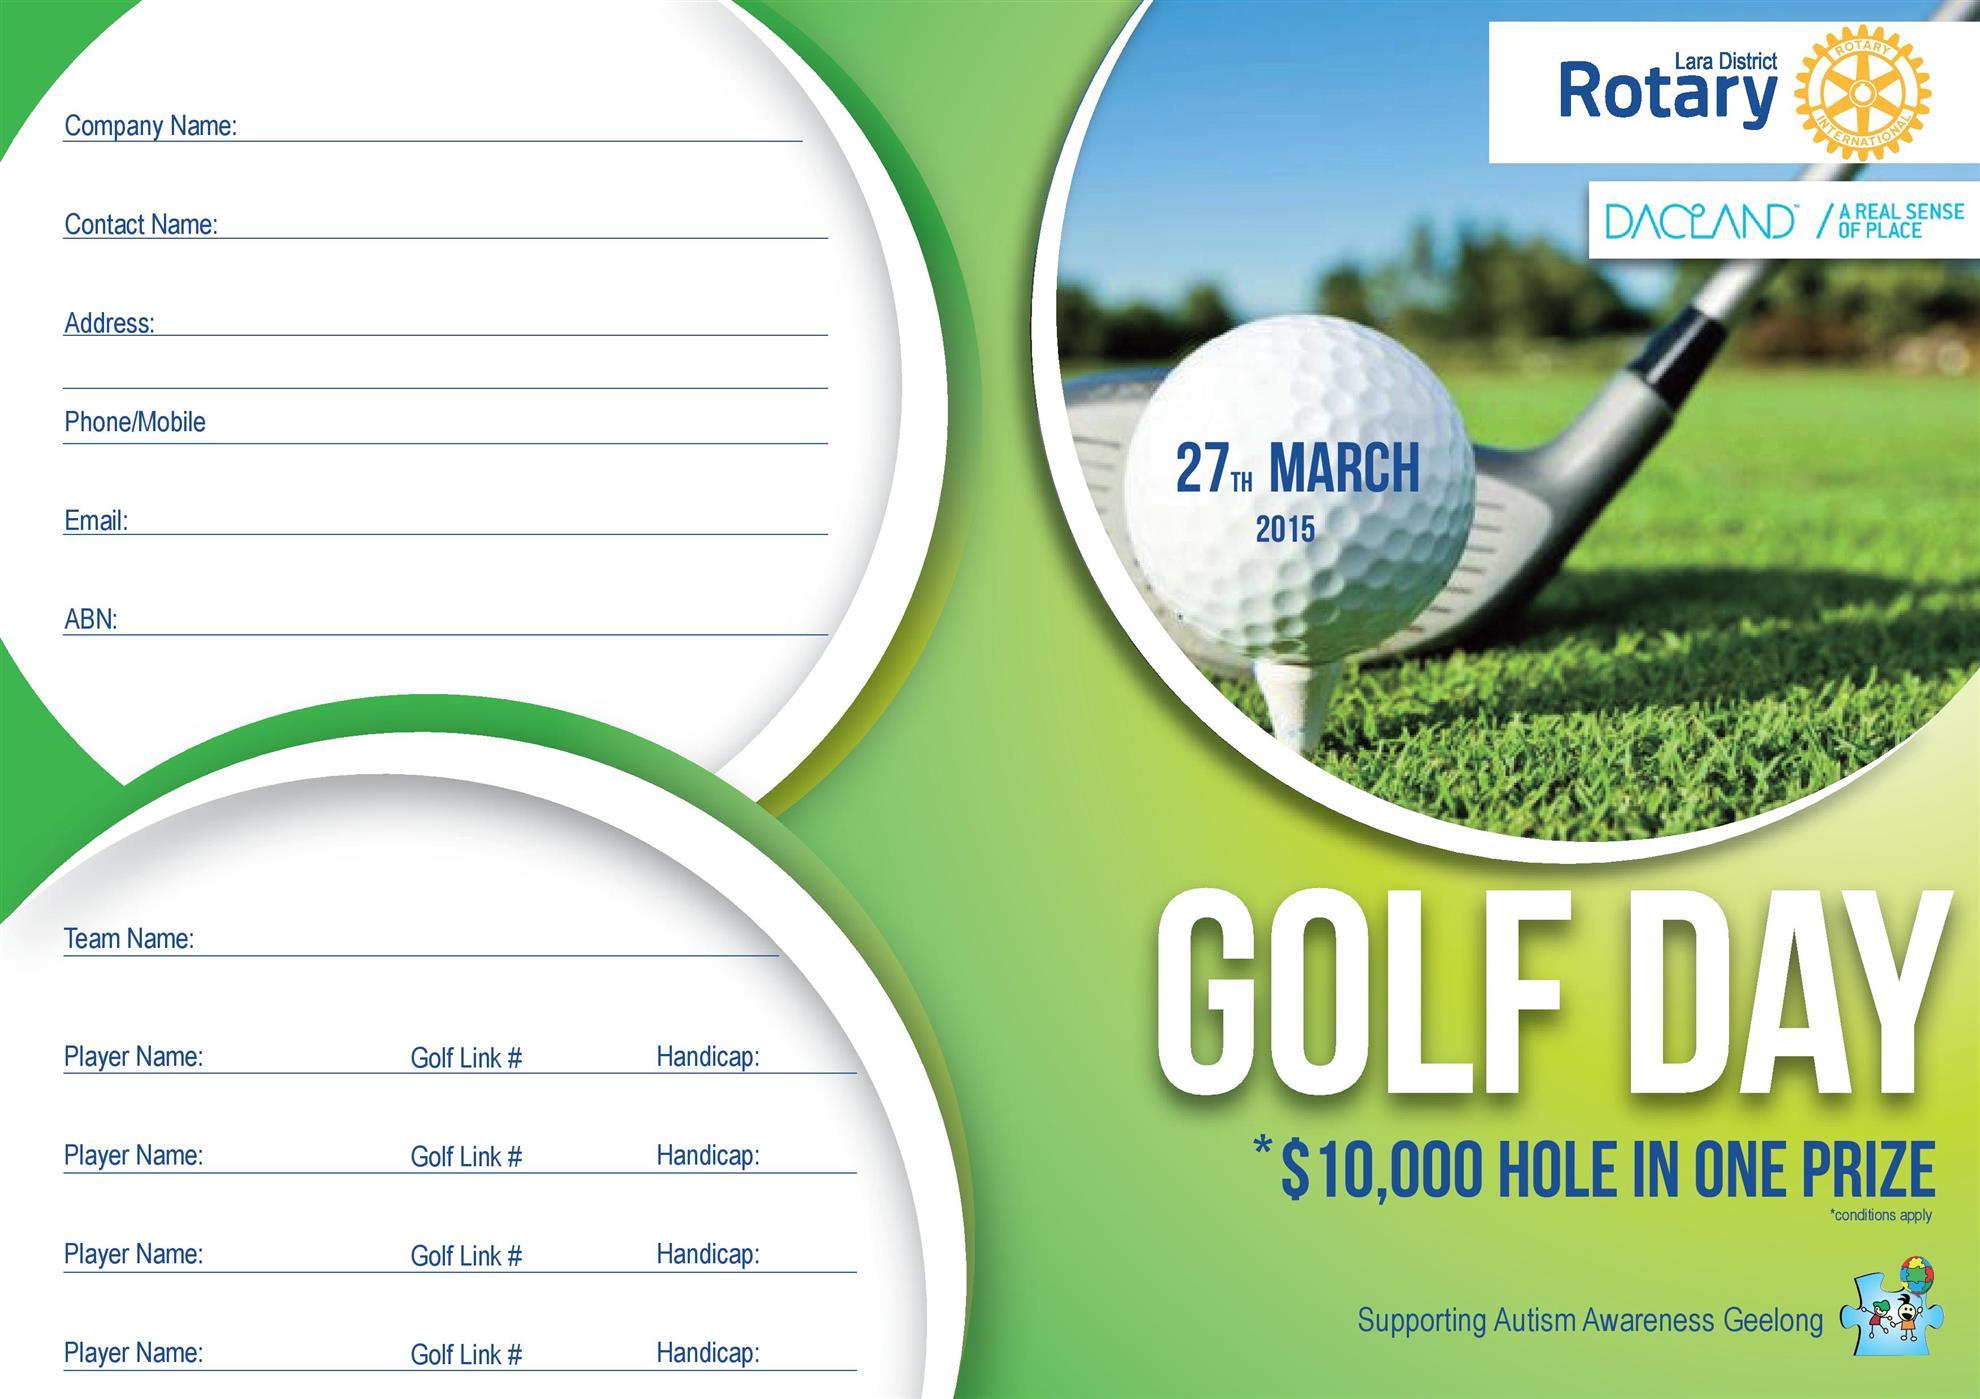 rc of lara golf day invitation rotary club of torquay